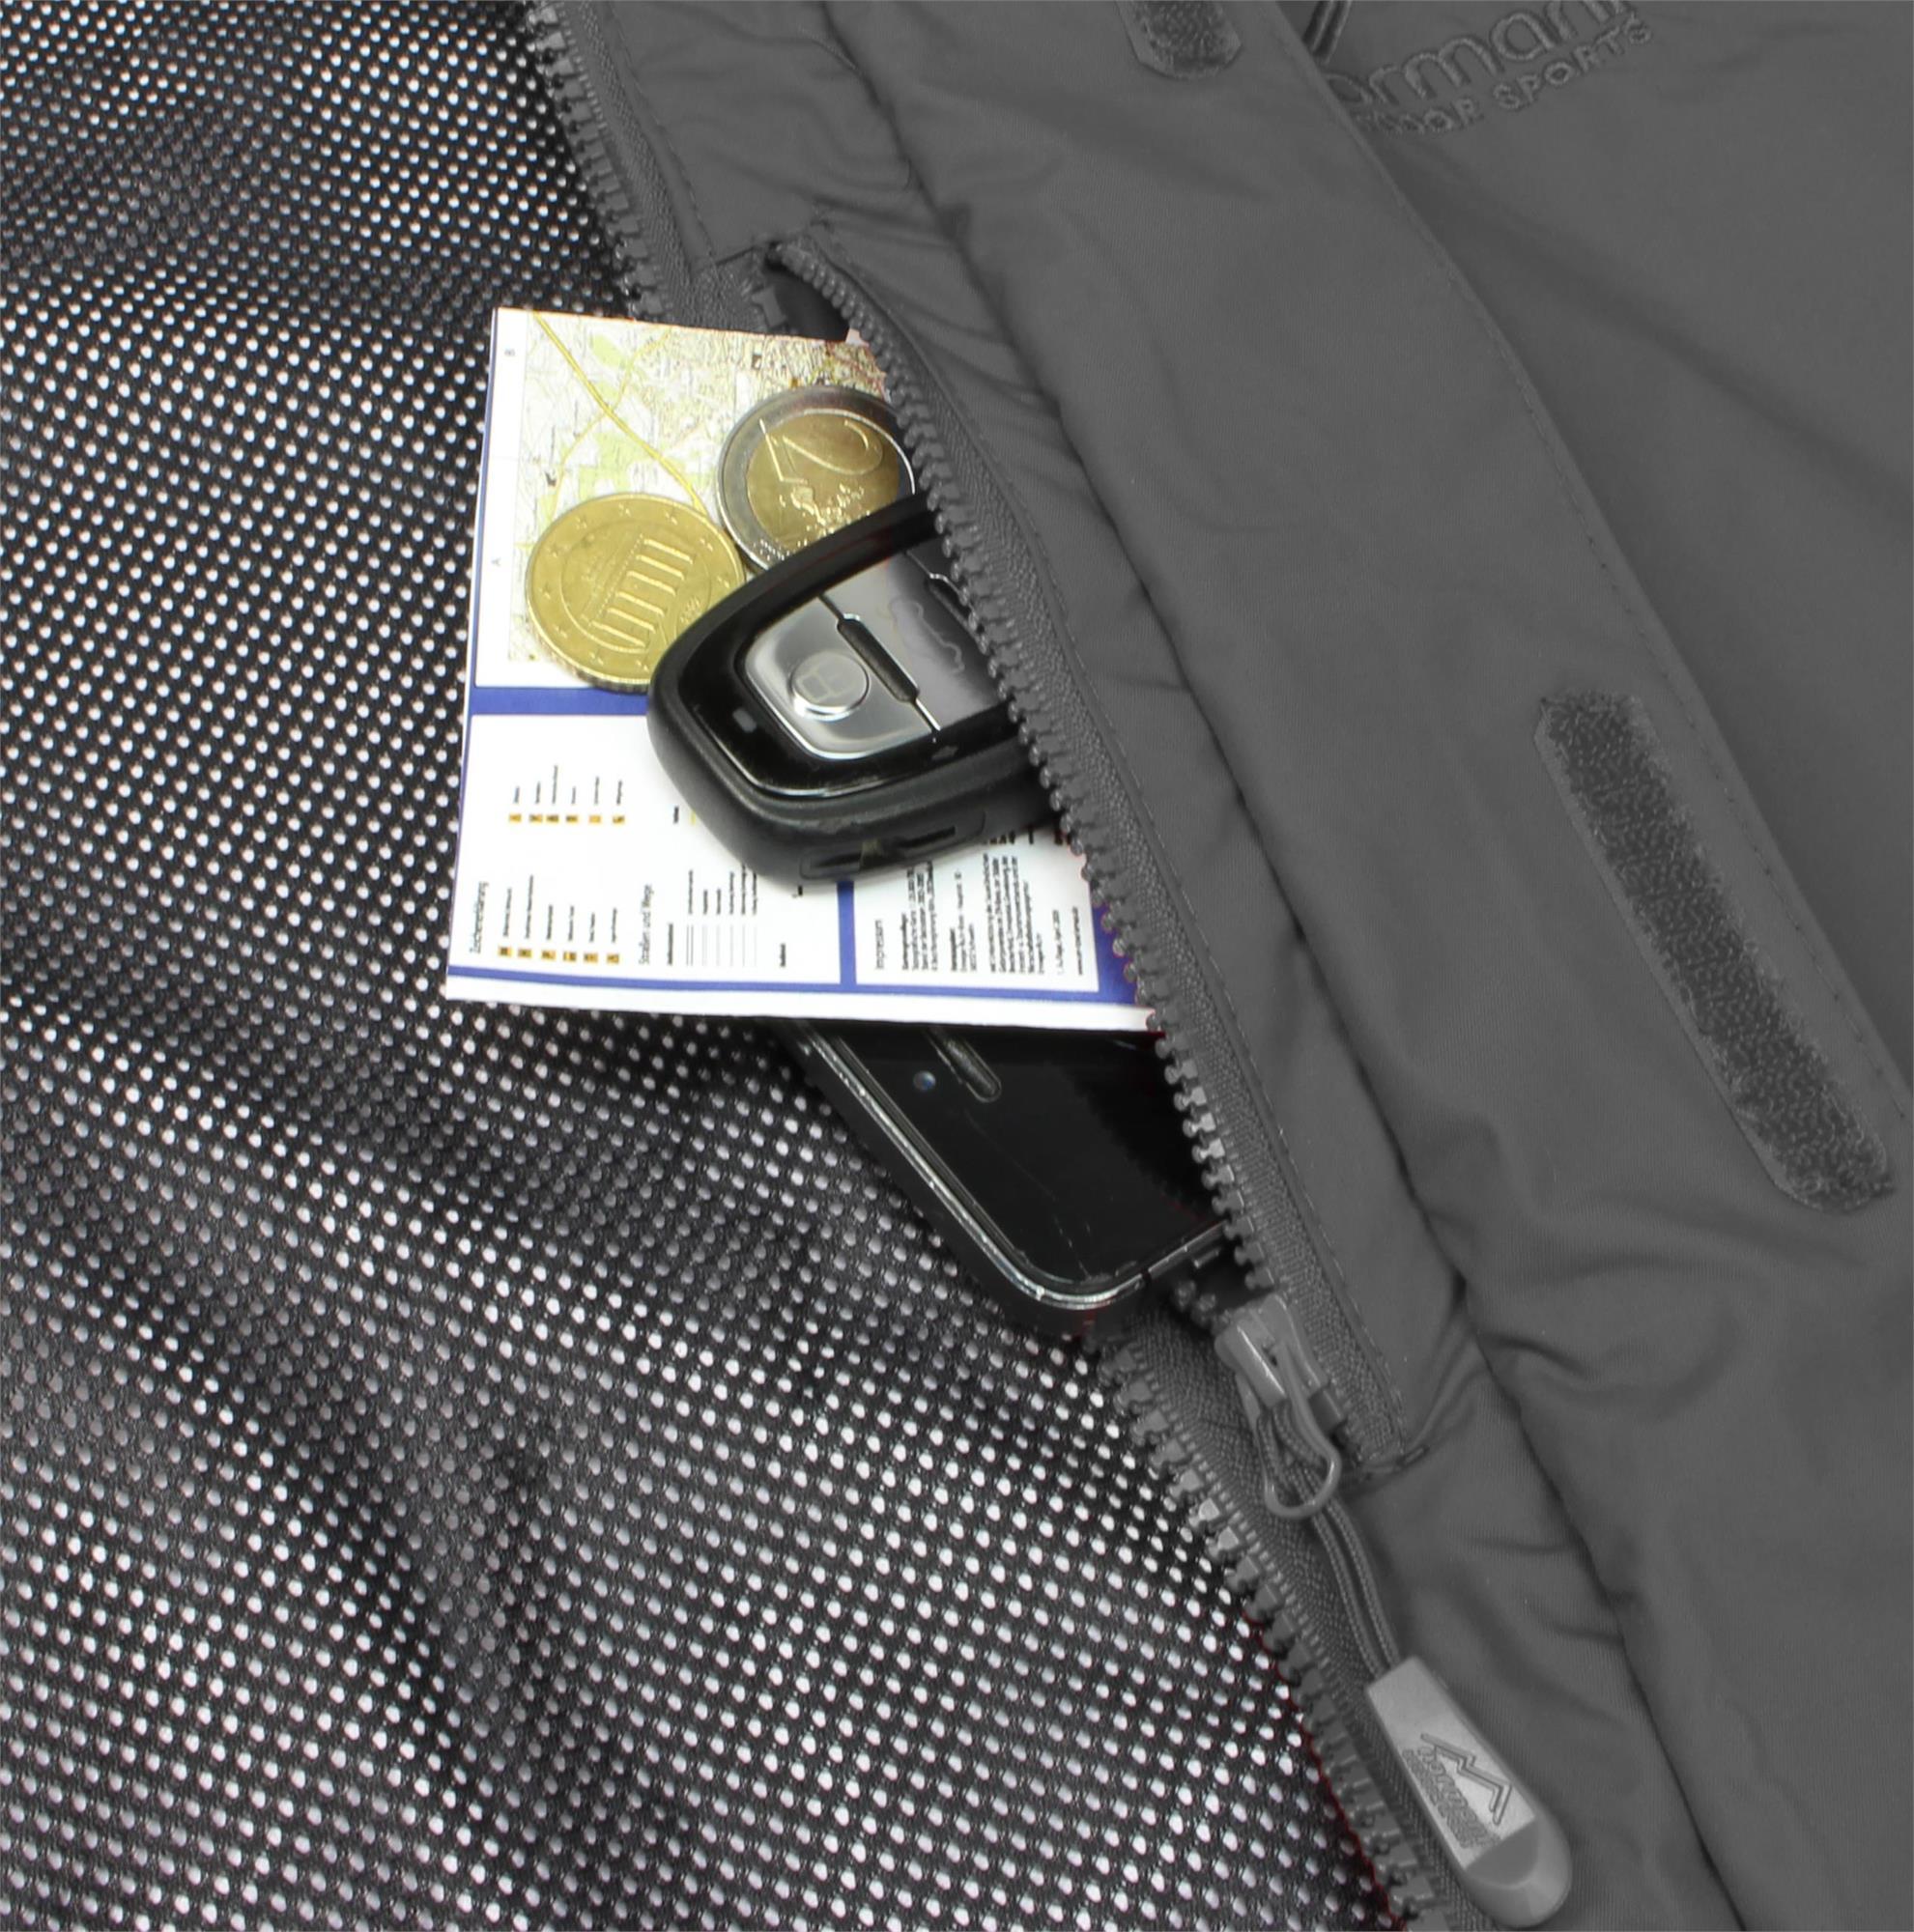 Indexbild 15 - Damen-Jacke Hardshelljacke Übergangs-Regenjacke mit Kapuze Wassersäule 10.000mm